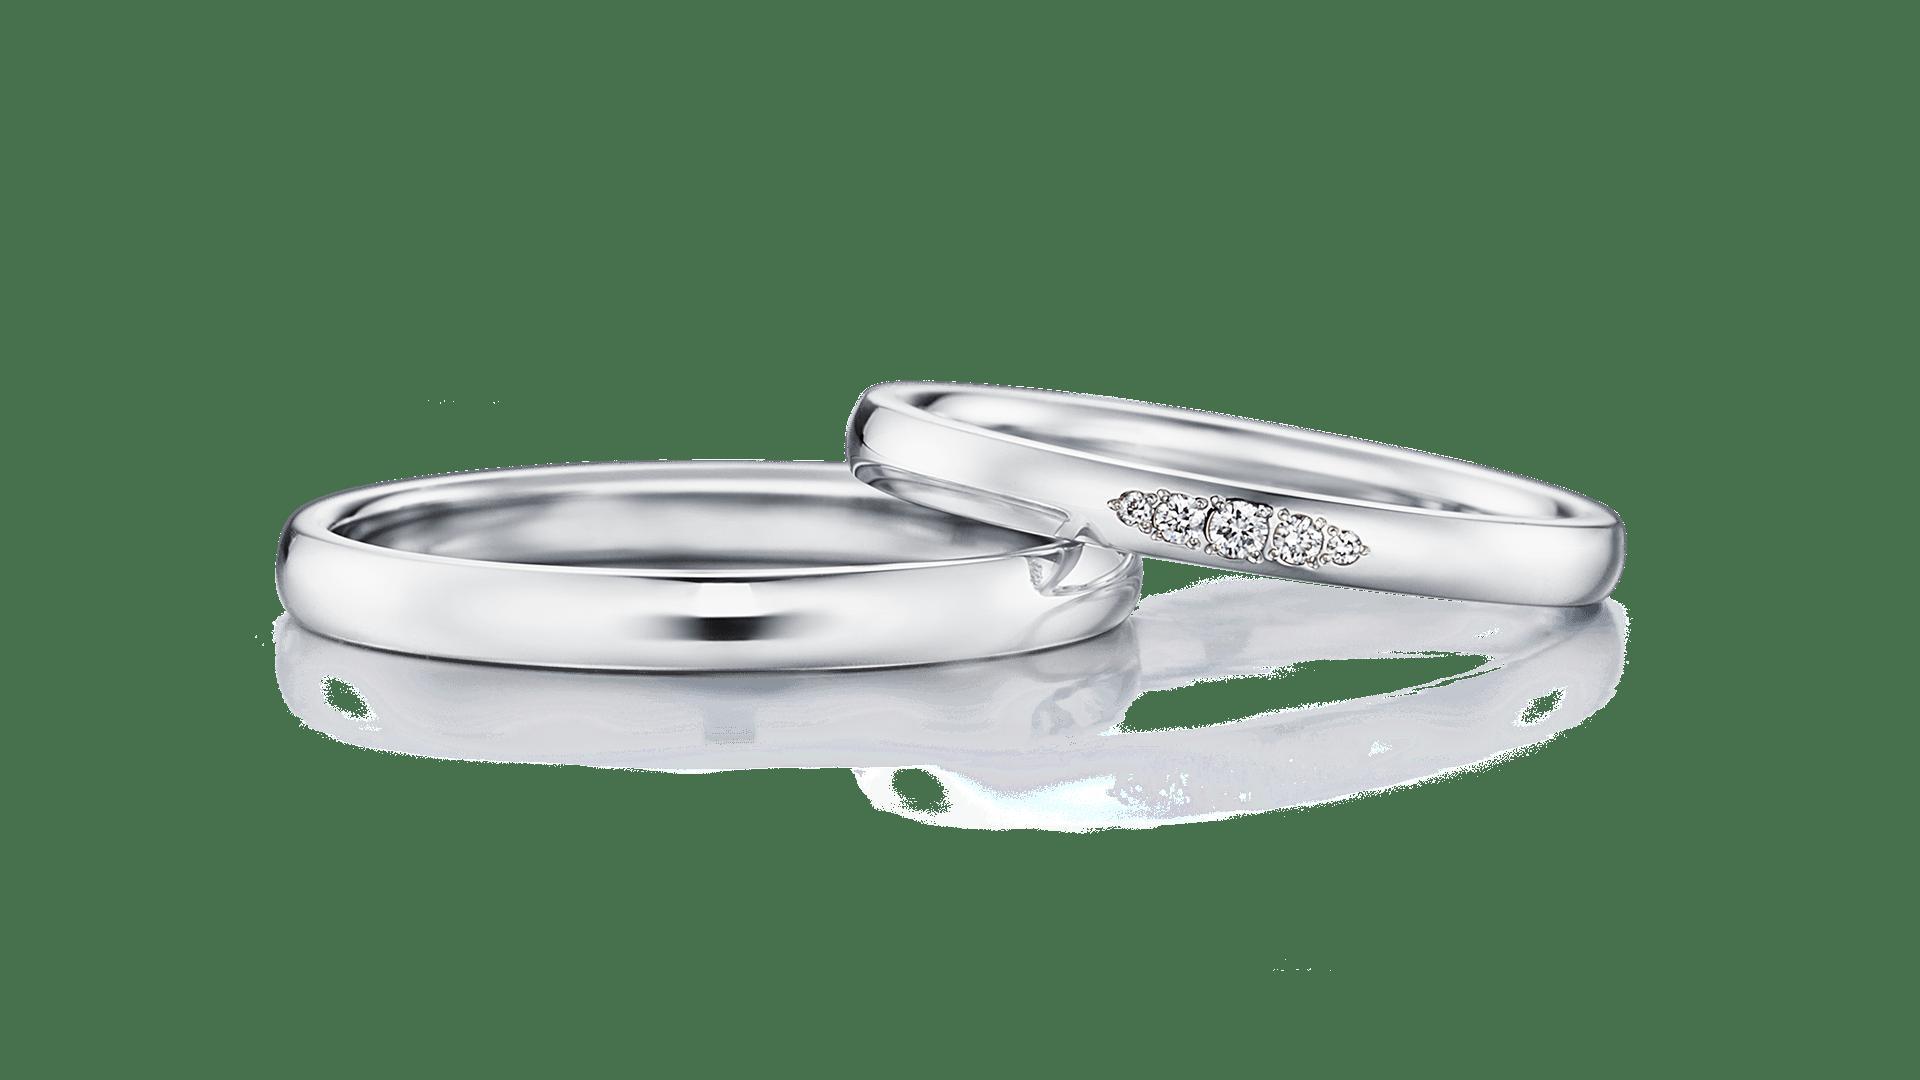 juno ユノー | 結婚指輪サムネイル 1